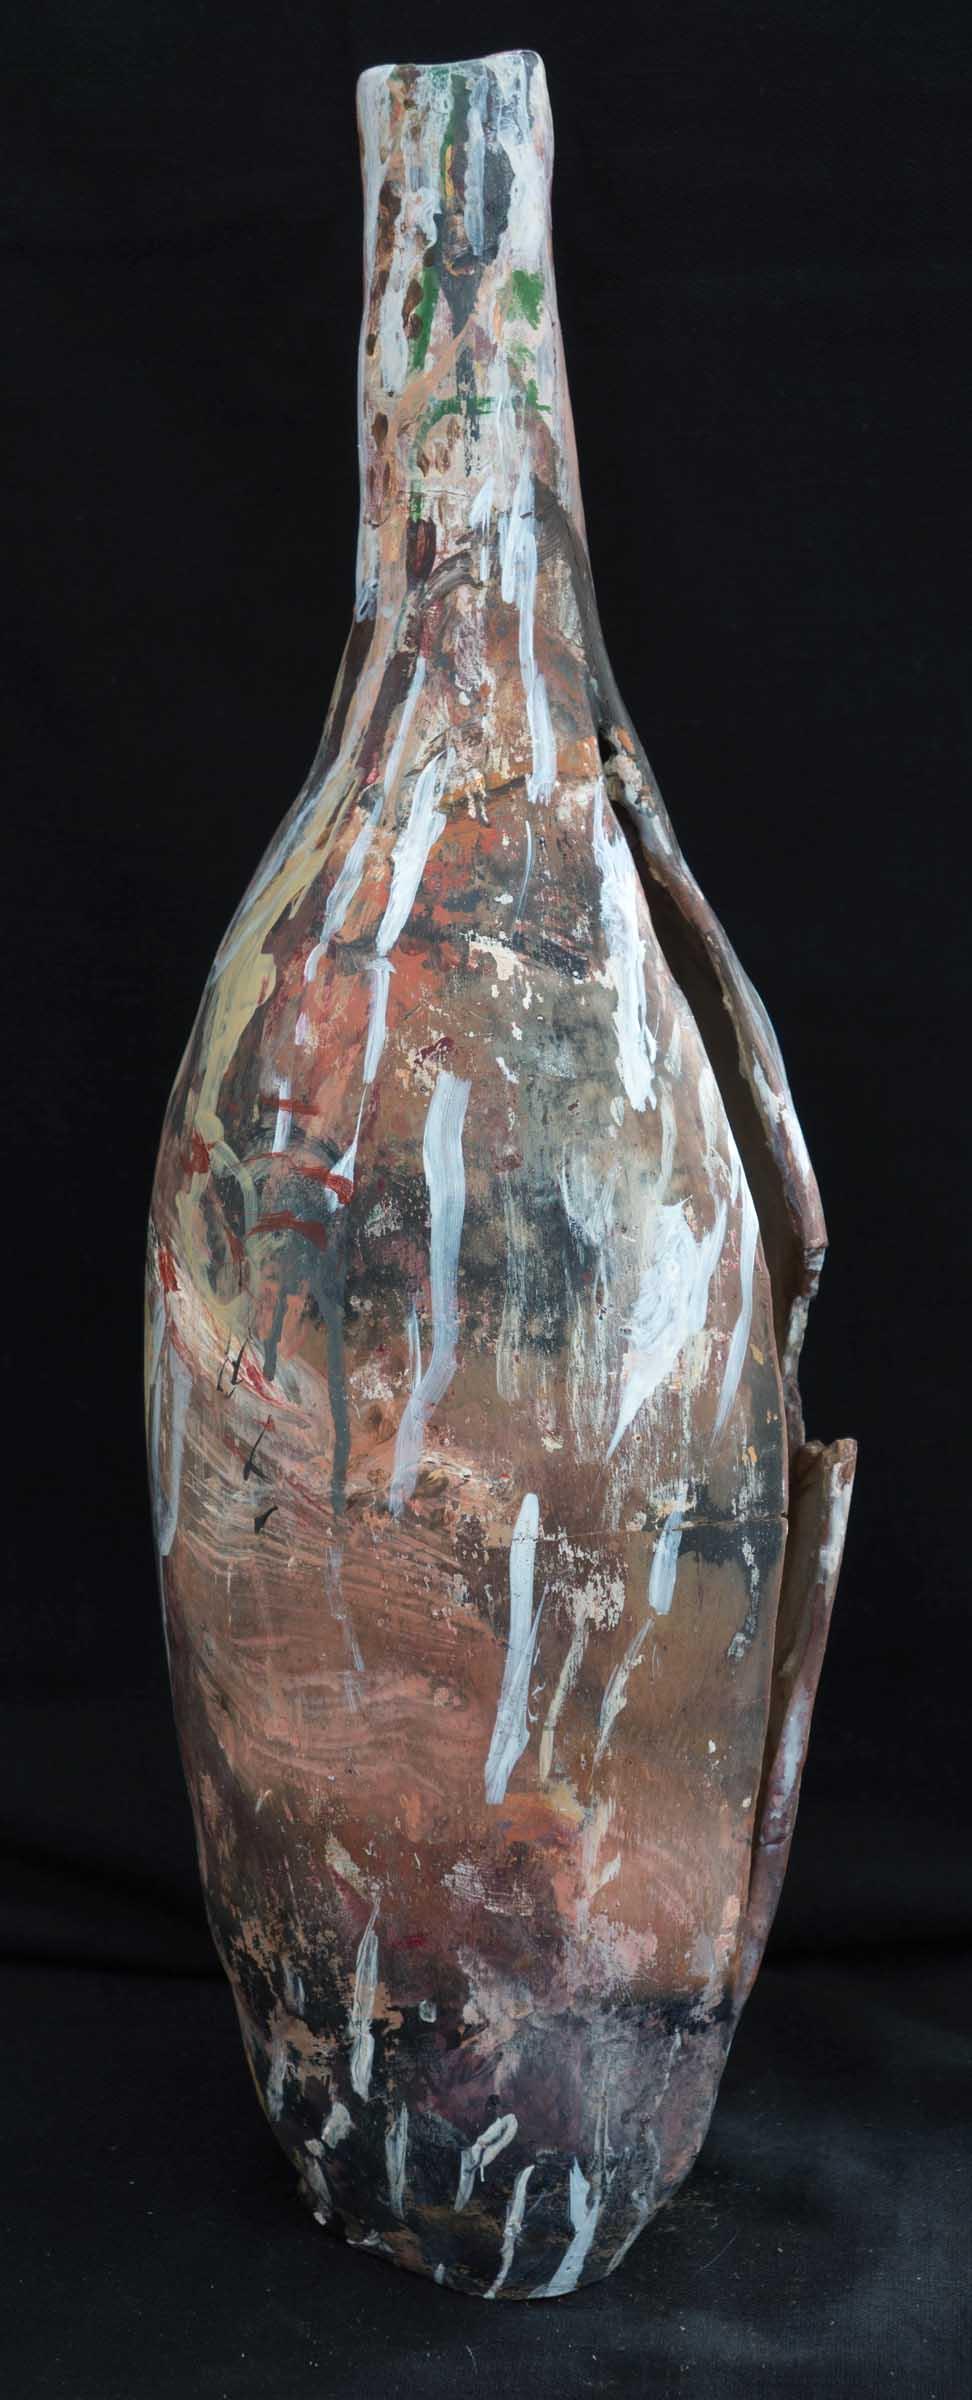 site-1-3-14 LR RAW-ceramics-1-a reworked.jpg